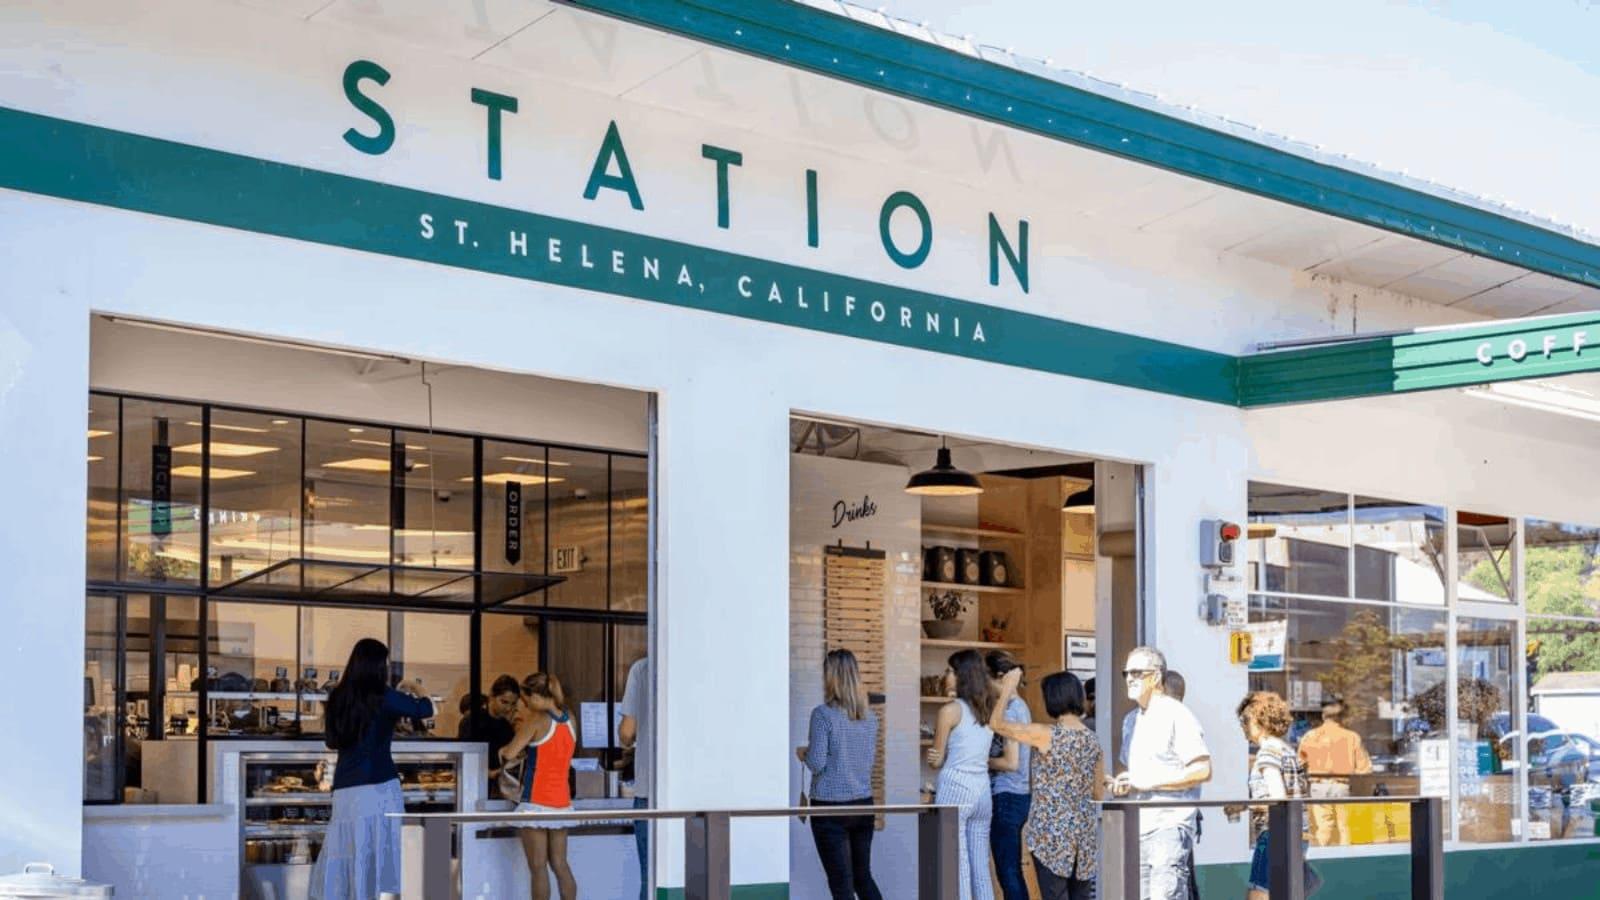 The Station St. Helena